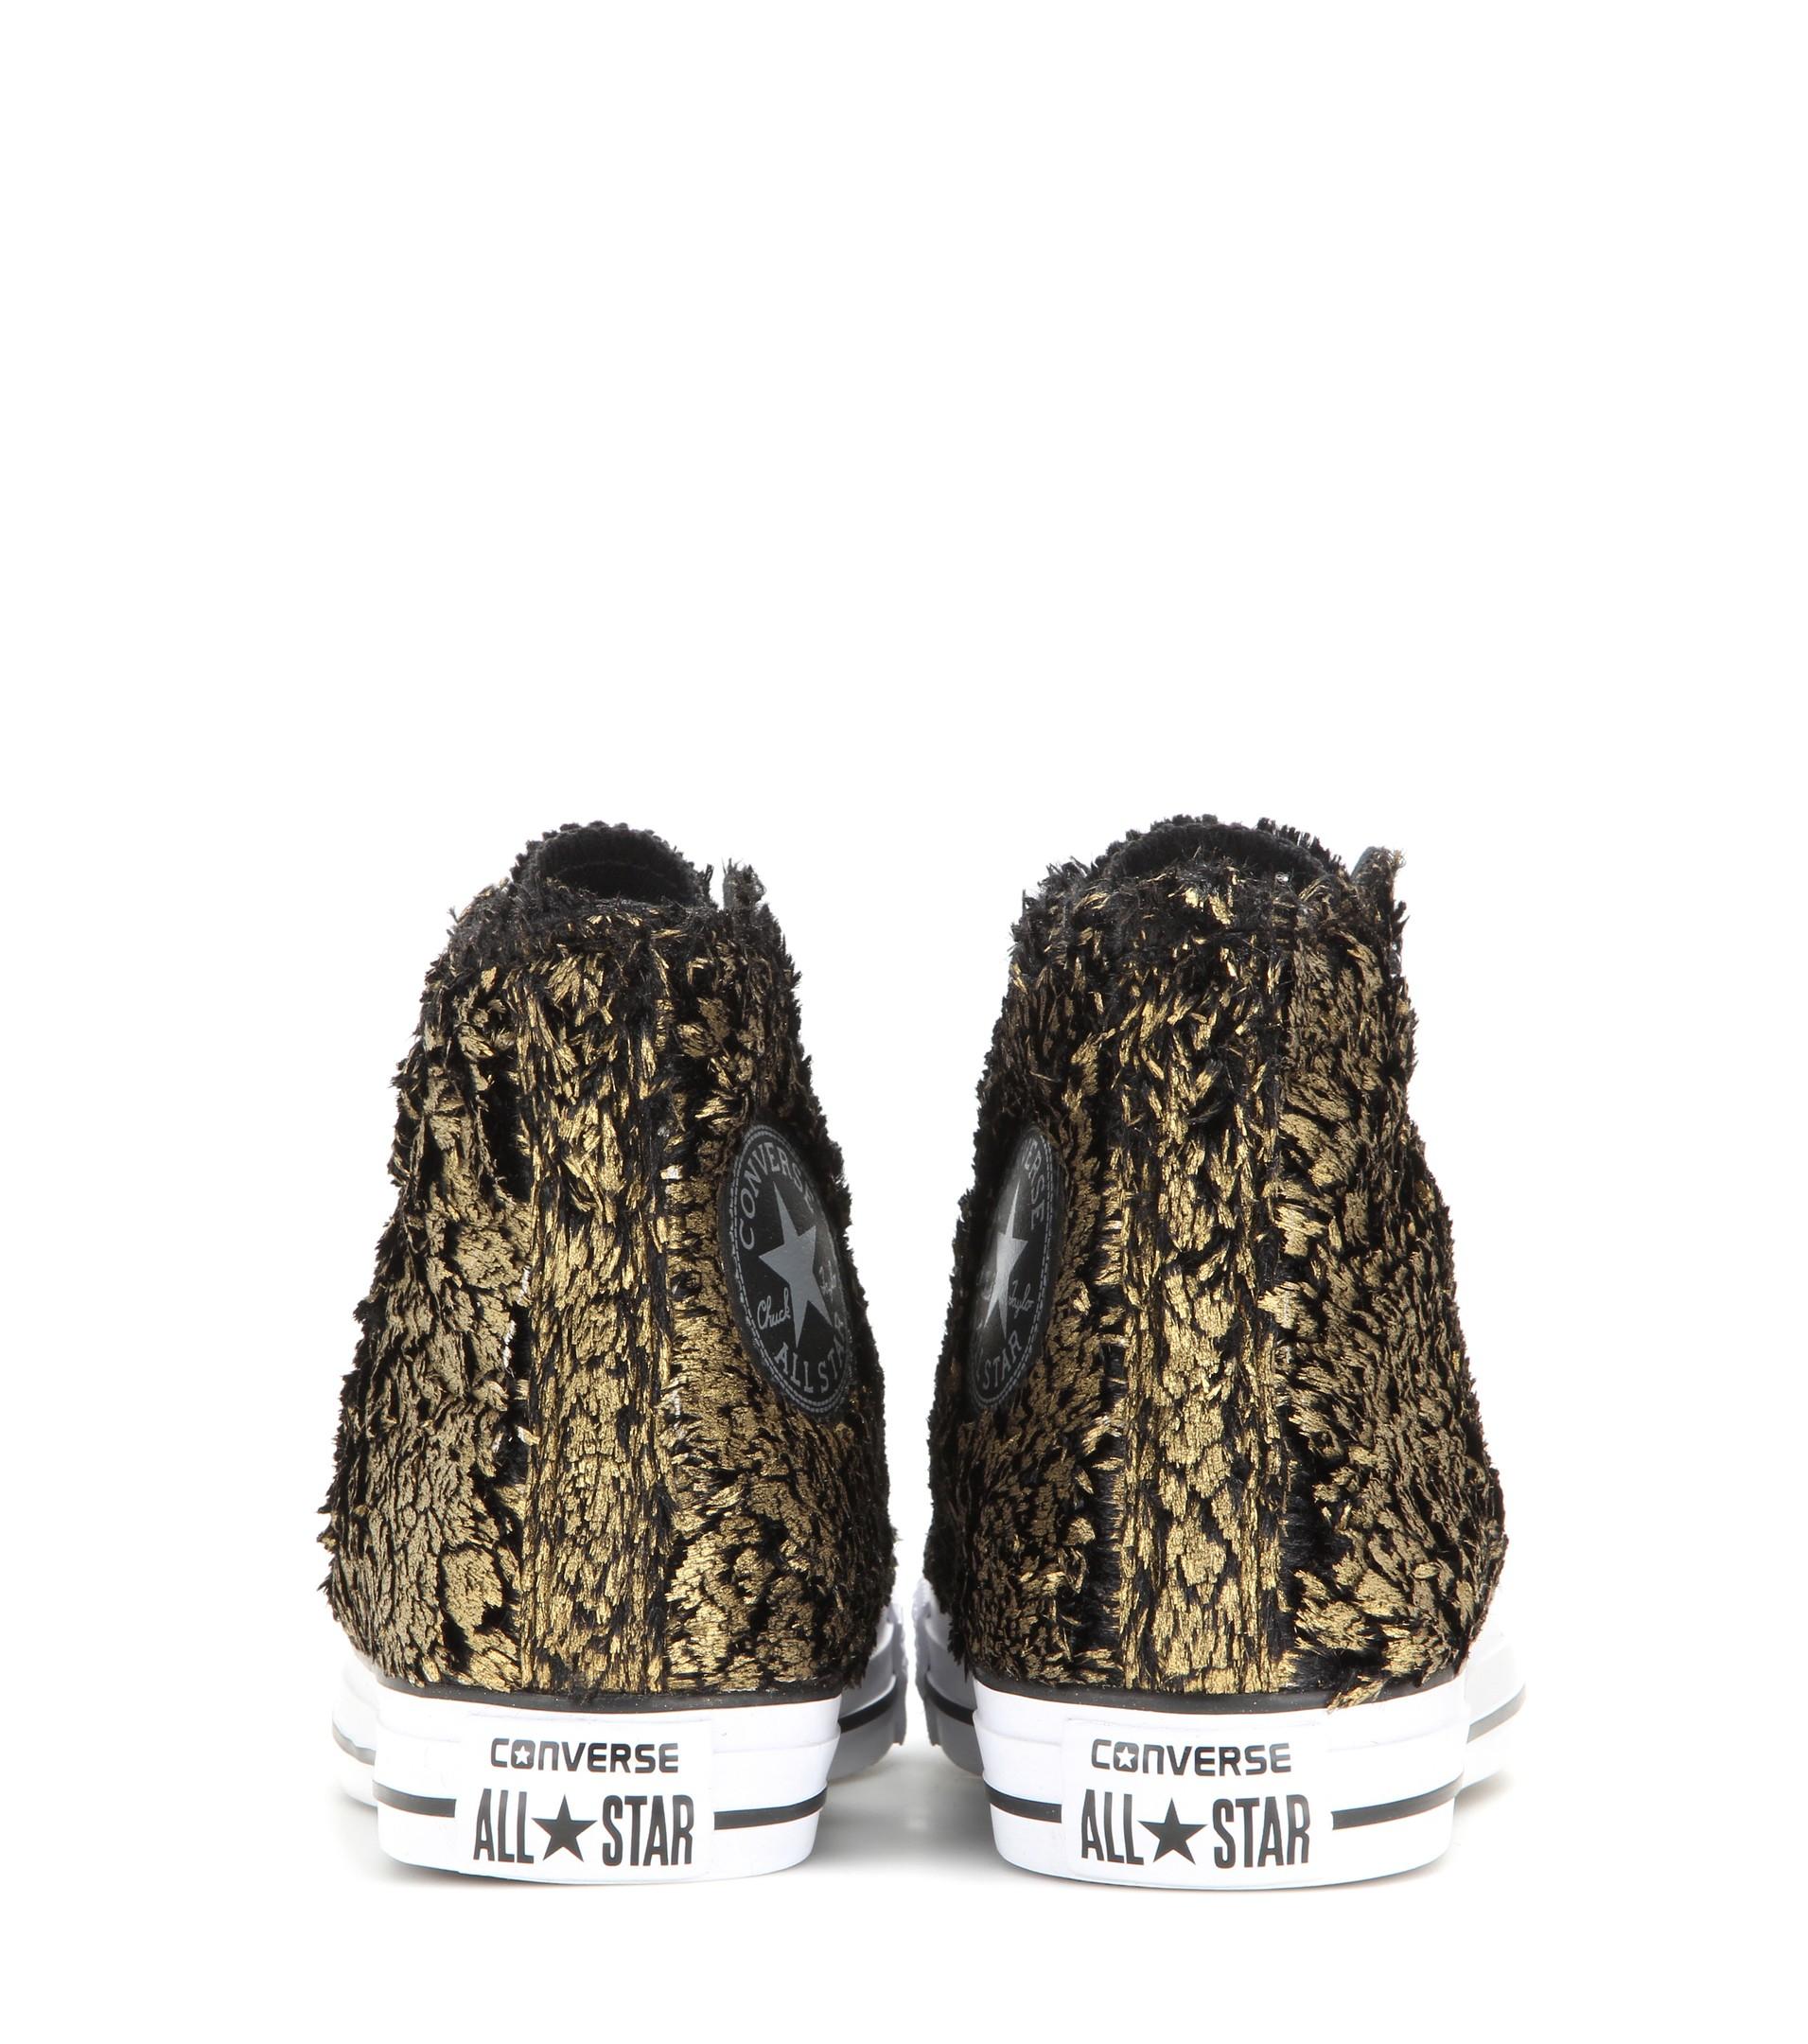 eabc243ec23c Lyst - Converse Chuck Taylor All Star Metallic Faux Fur High-top Sneakers  in Metallic